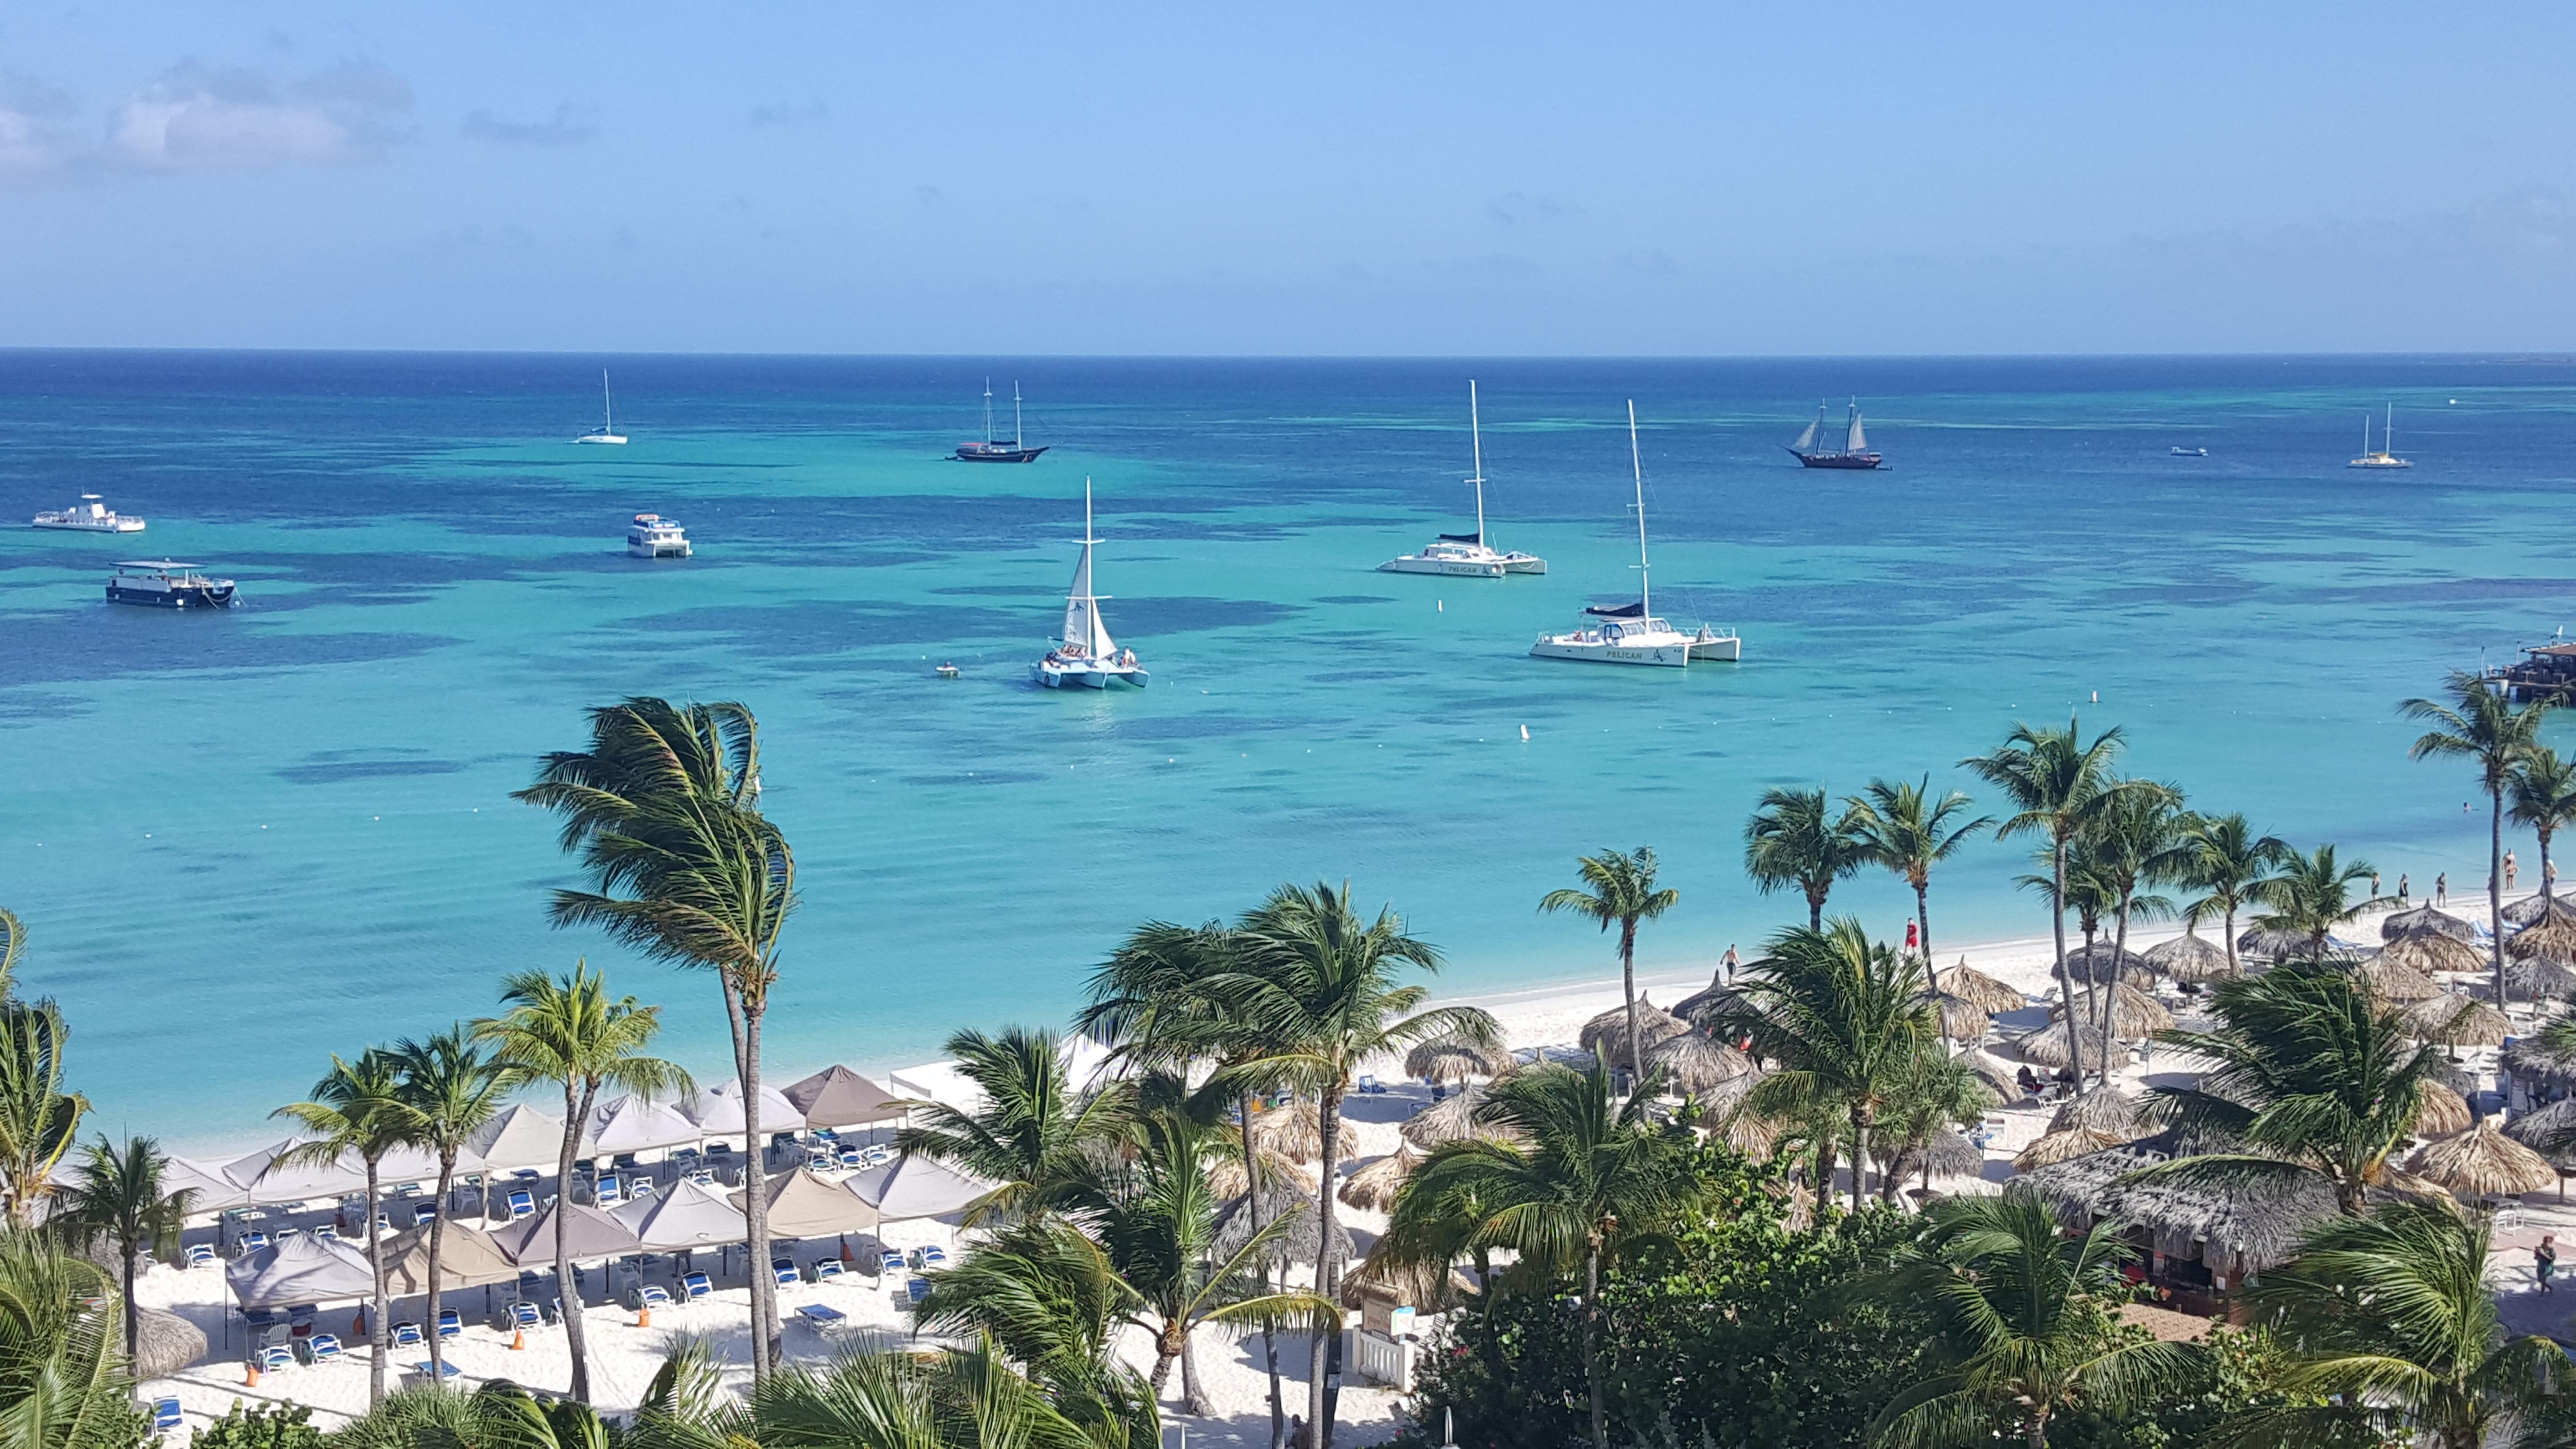 Hyatt Regency Aruba, Palm Beach, Aruba